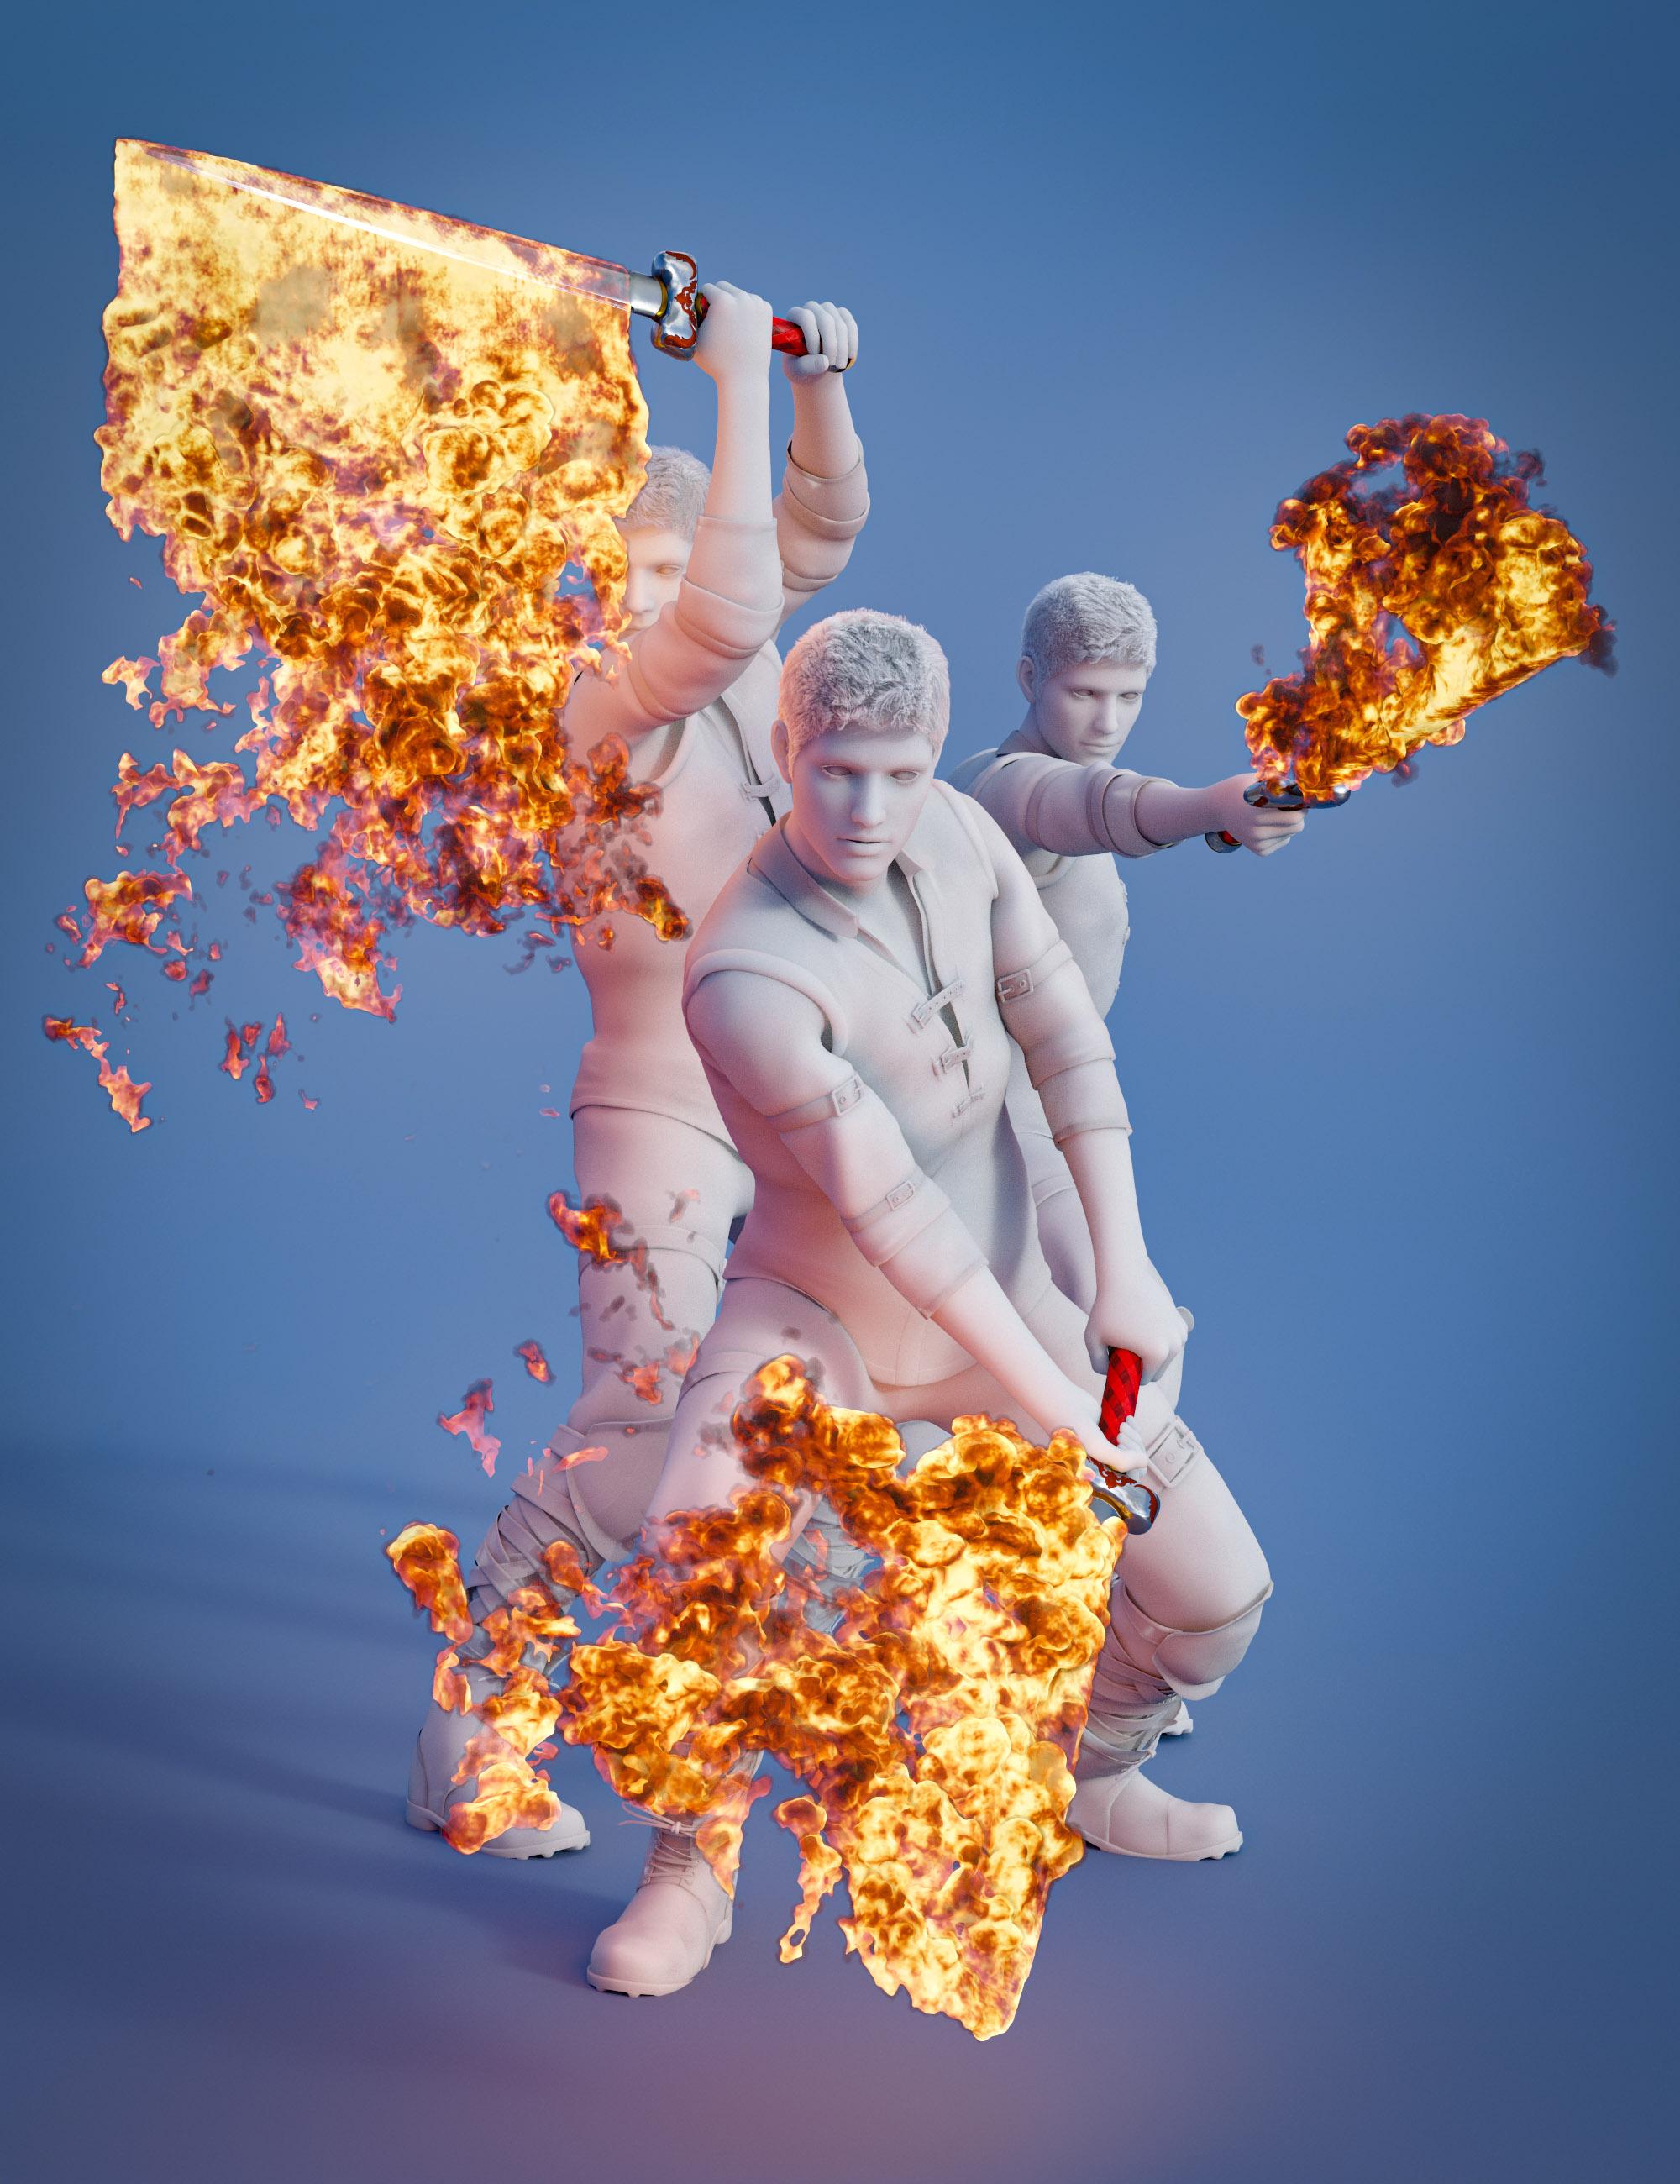 Pyromantix - Fire Swords by: DimensionTheory, 3D Models by Daz 3D